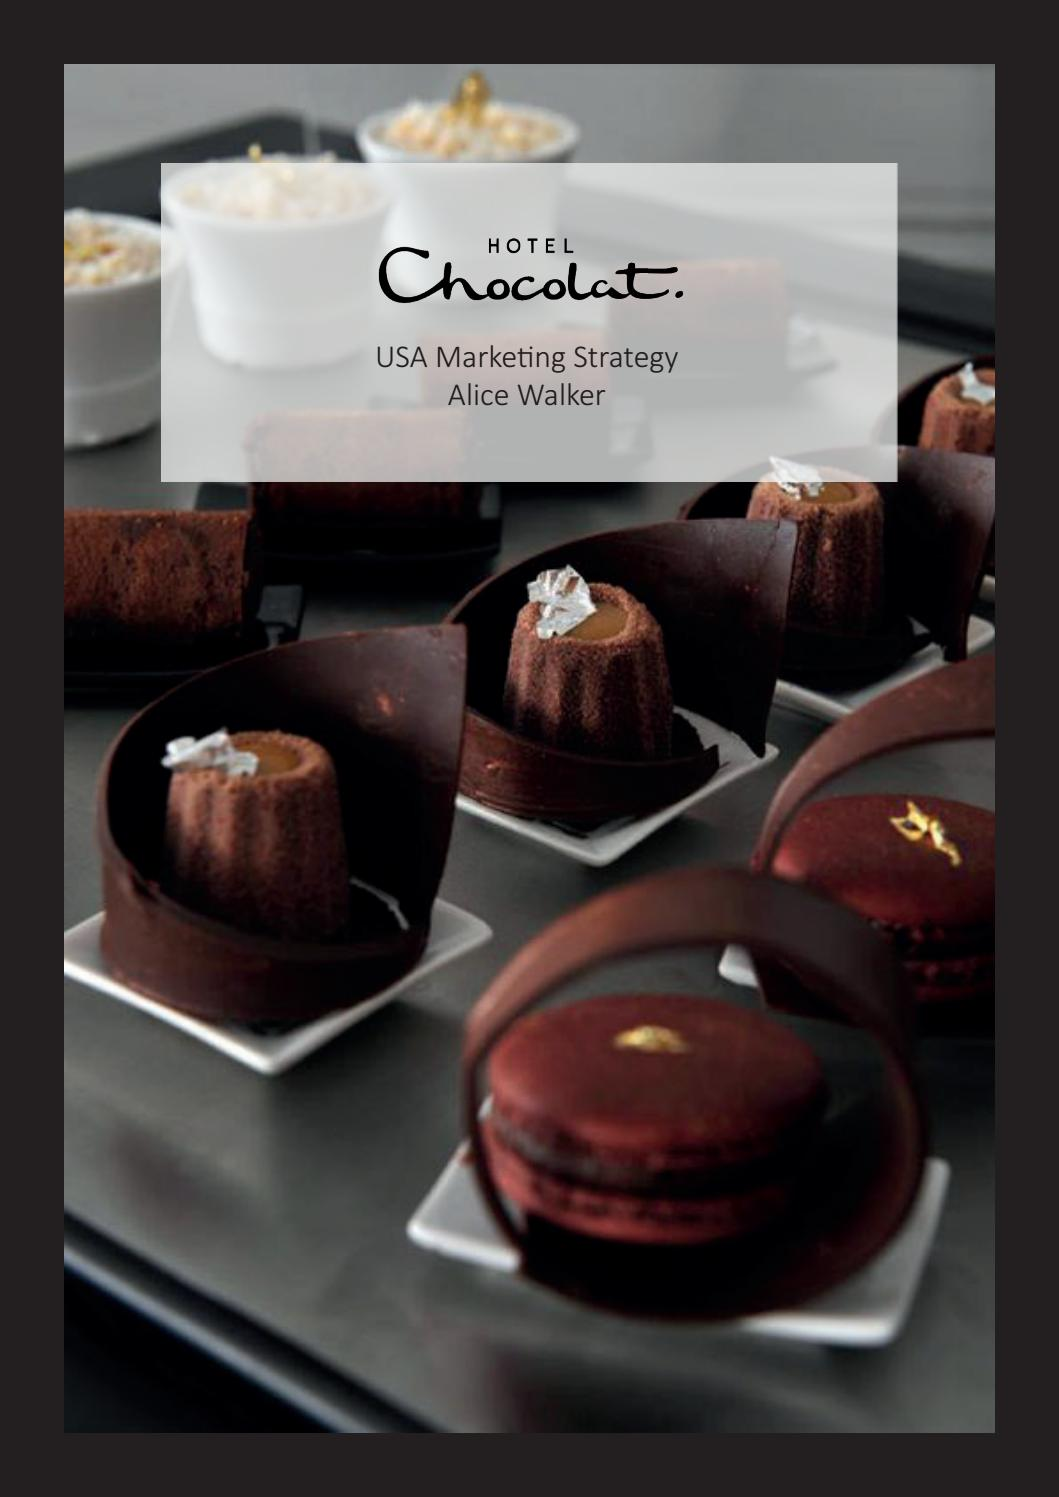 Hotel Chocolate Usa Marketing Strategy By Alice Walker Issuu